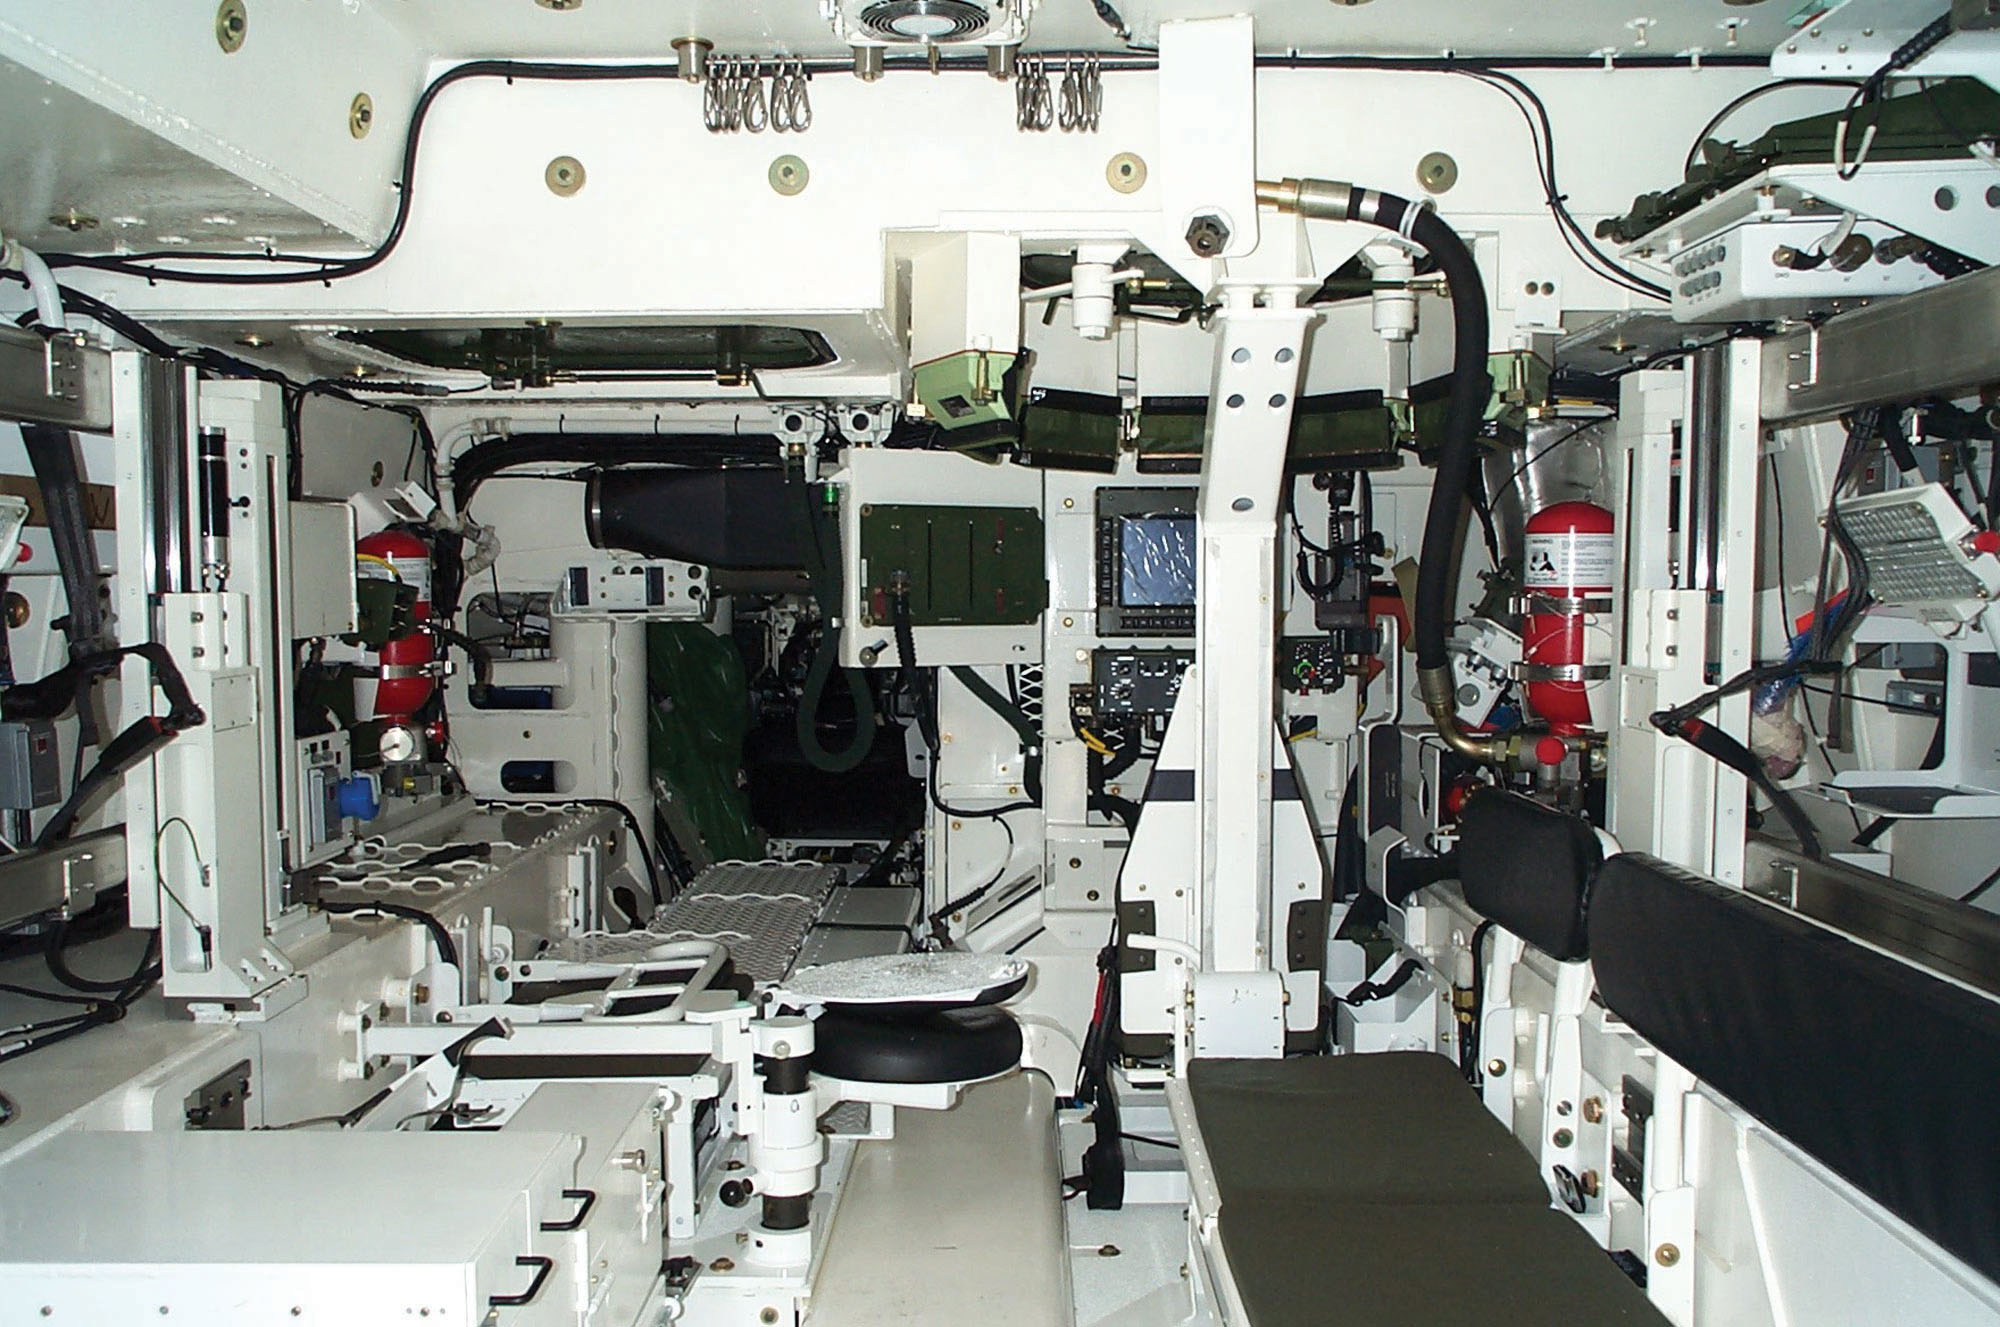 M113 Apc For Sale >> File:Strykerinterior lg.jpg - Wikimedia Commons